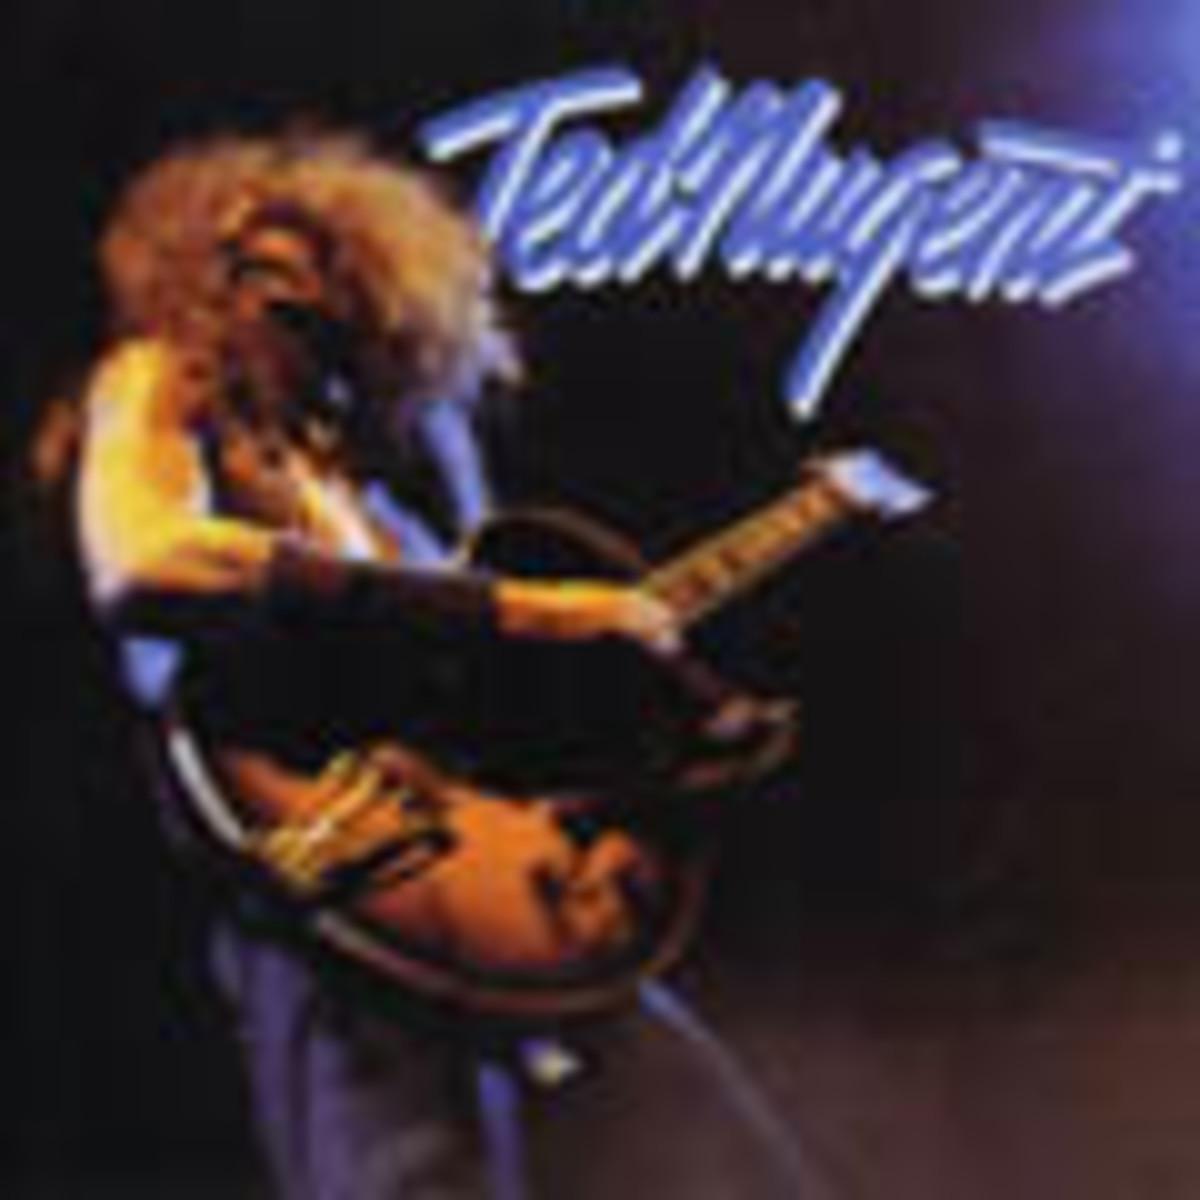 Ted Nugent Ted Nugent album